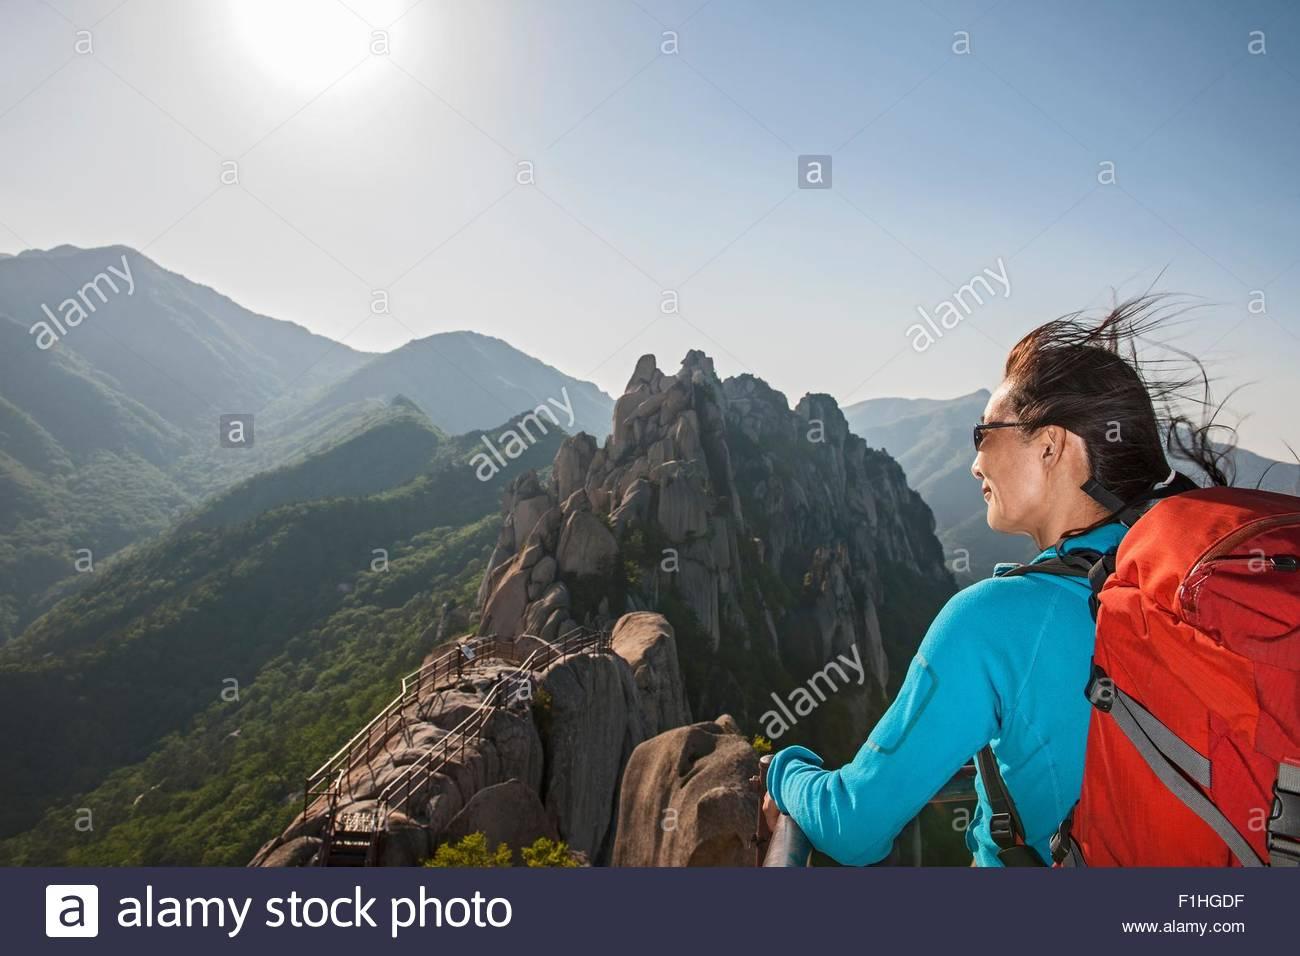 Hiker on top of Mt. Ulsanbawi at Seoraksan national park, Gangwon, South Korea - Stock Image